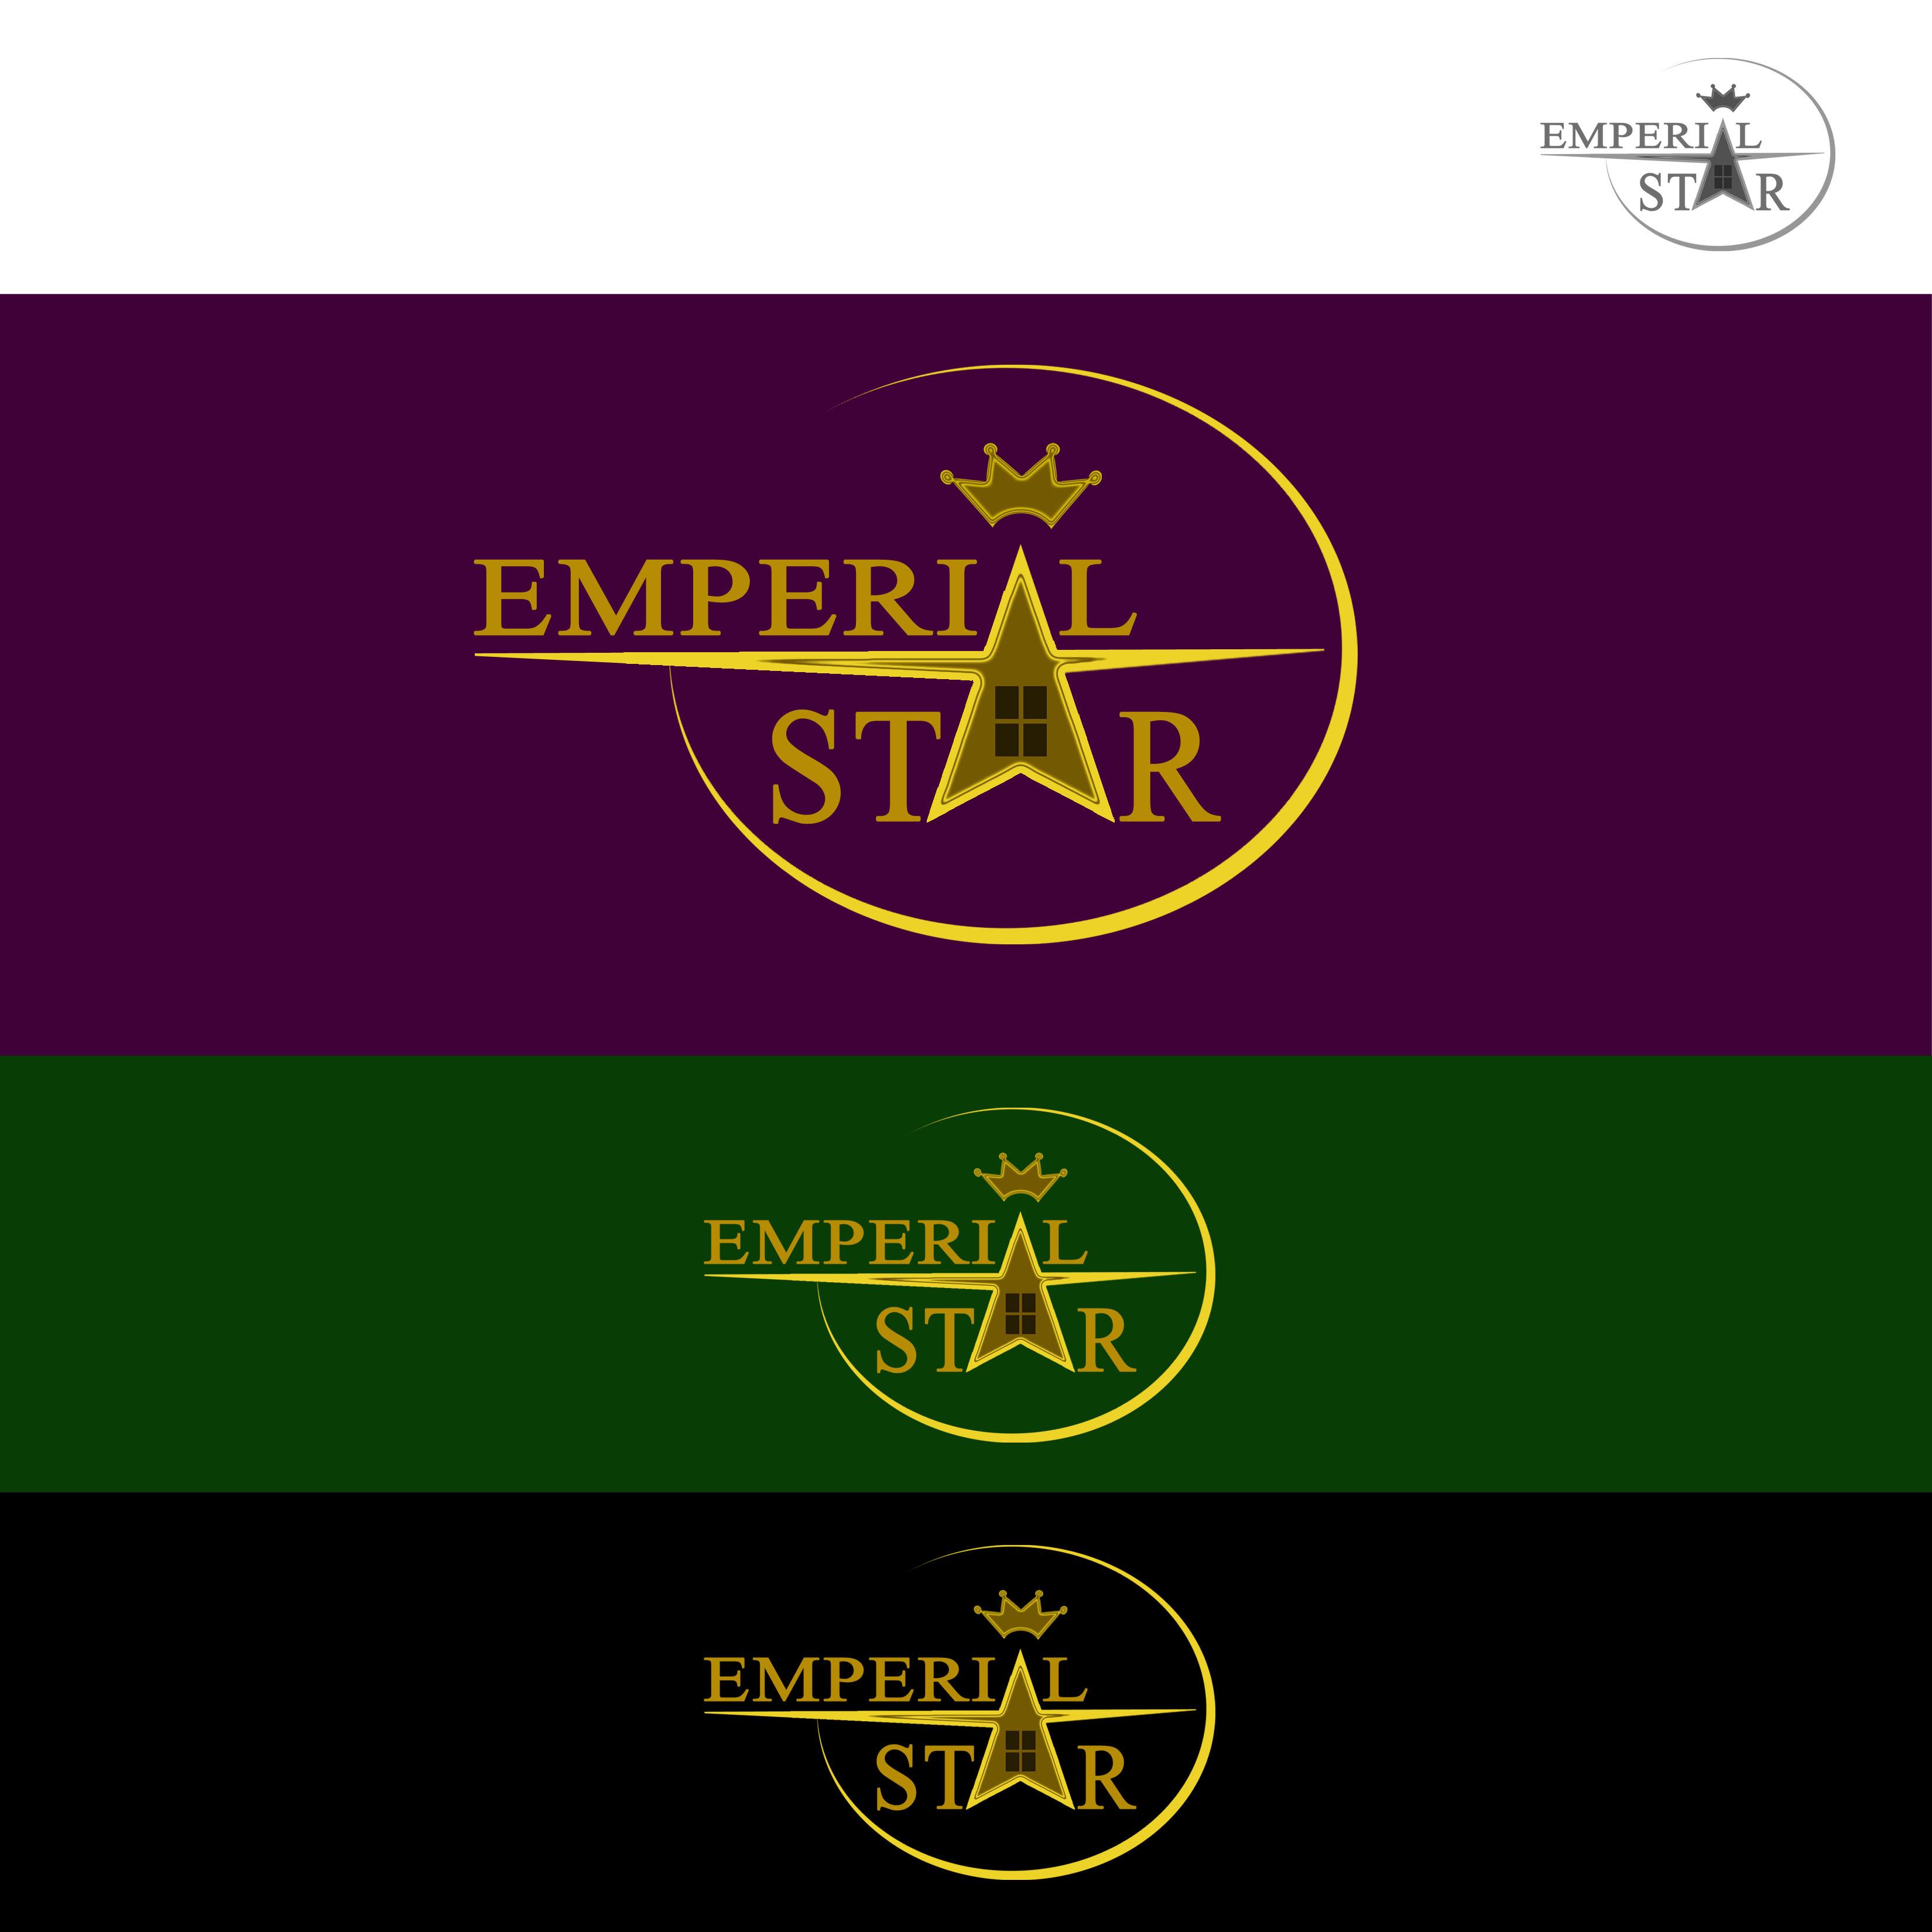 Logo Design by Alan Esclamado - Entry No. 107 in the Logo Design Contest Emperial Star Logo Design.